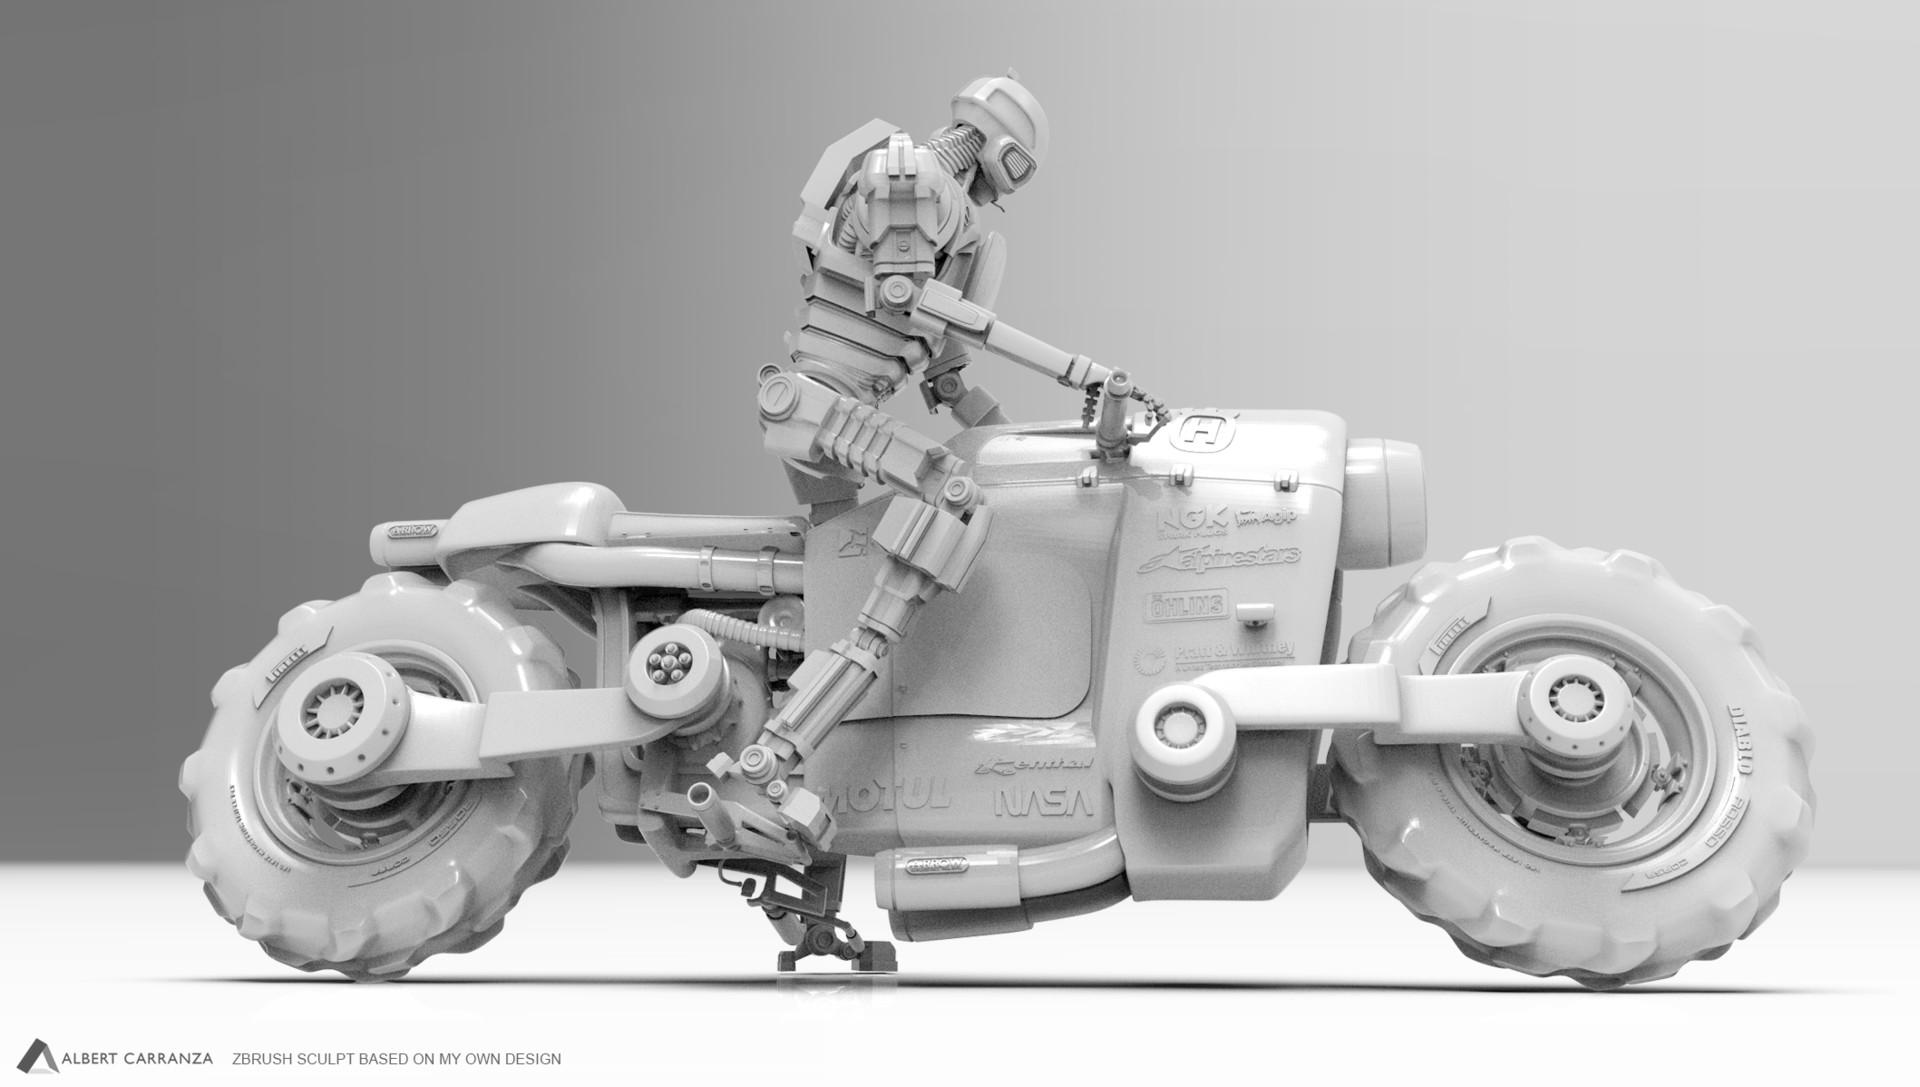 Albert carranza droneandbike3